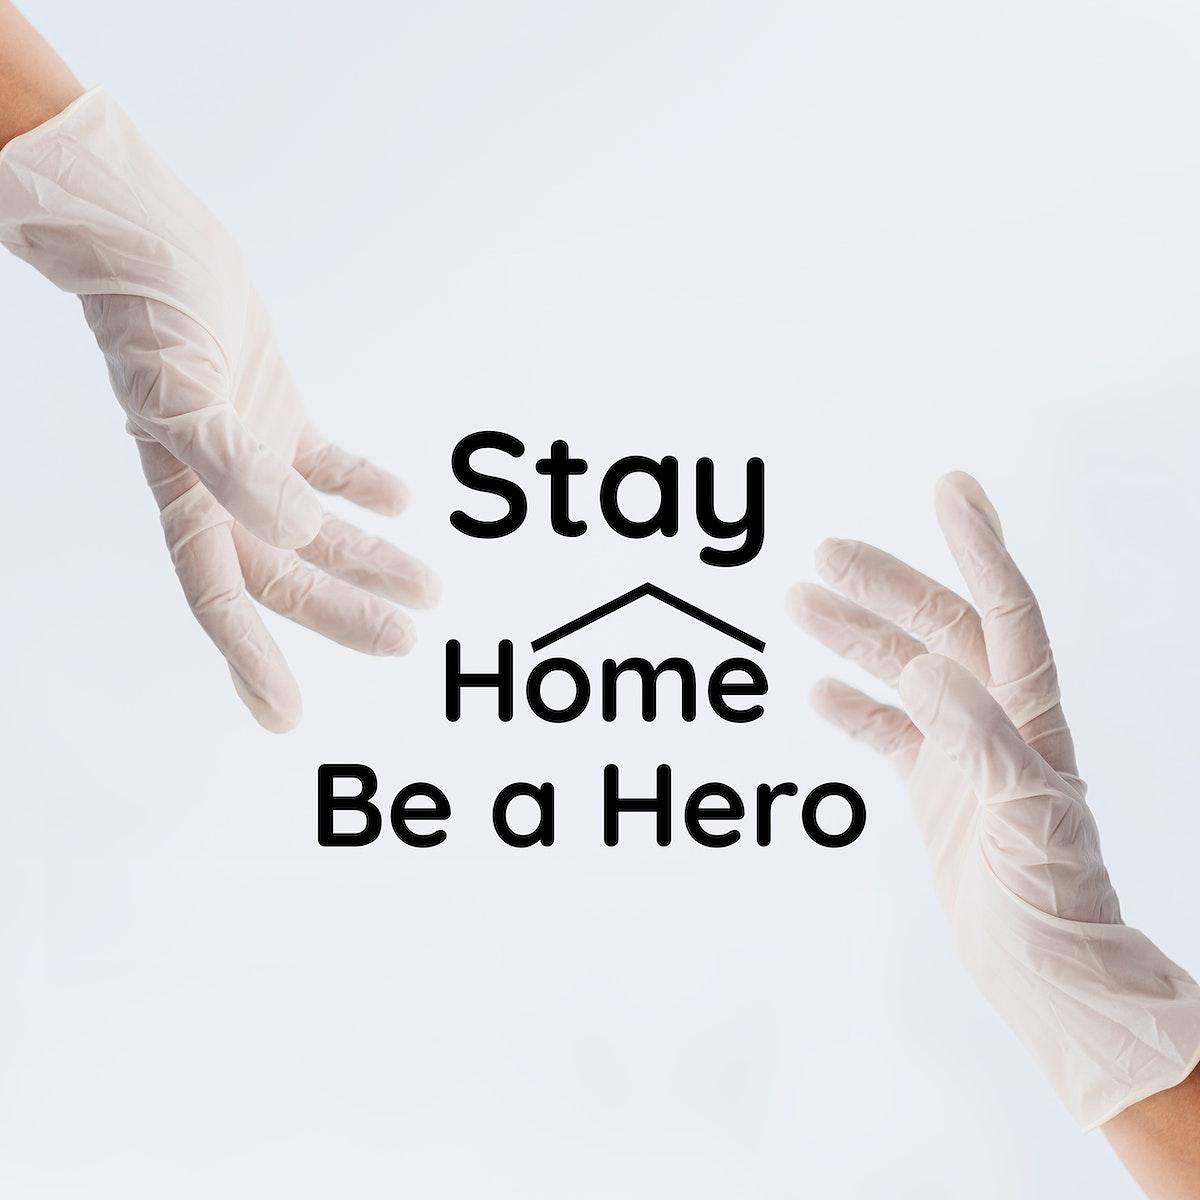 Stay home be a hero during coronavirus pandemic